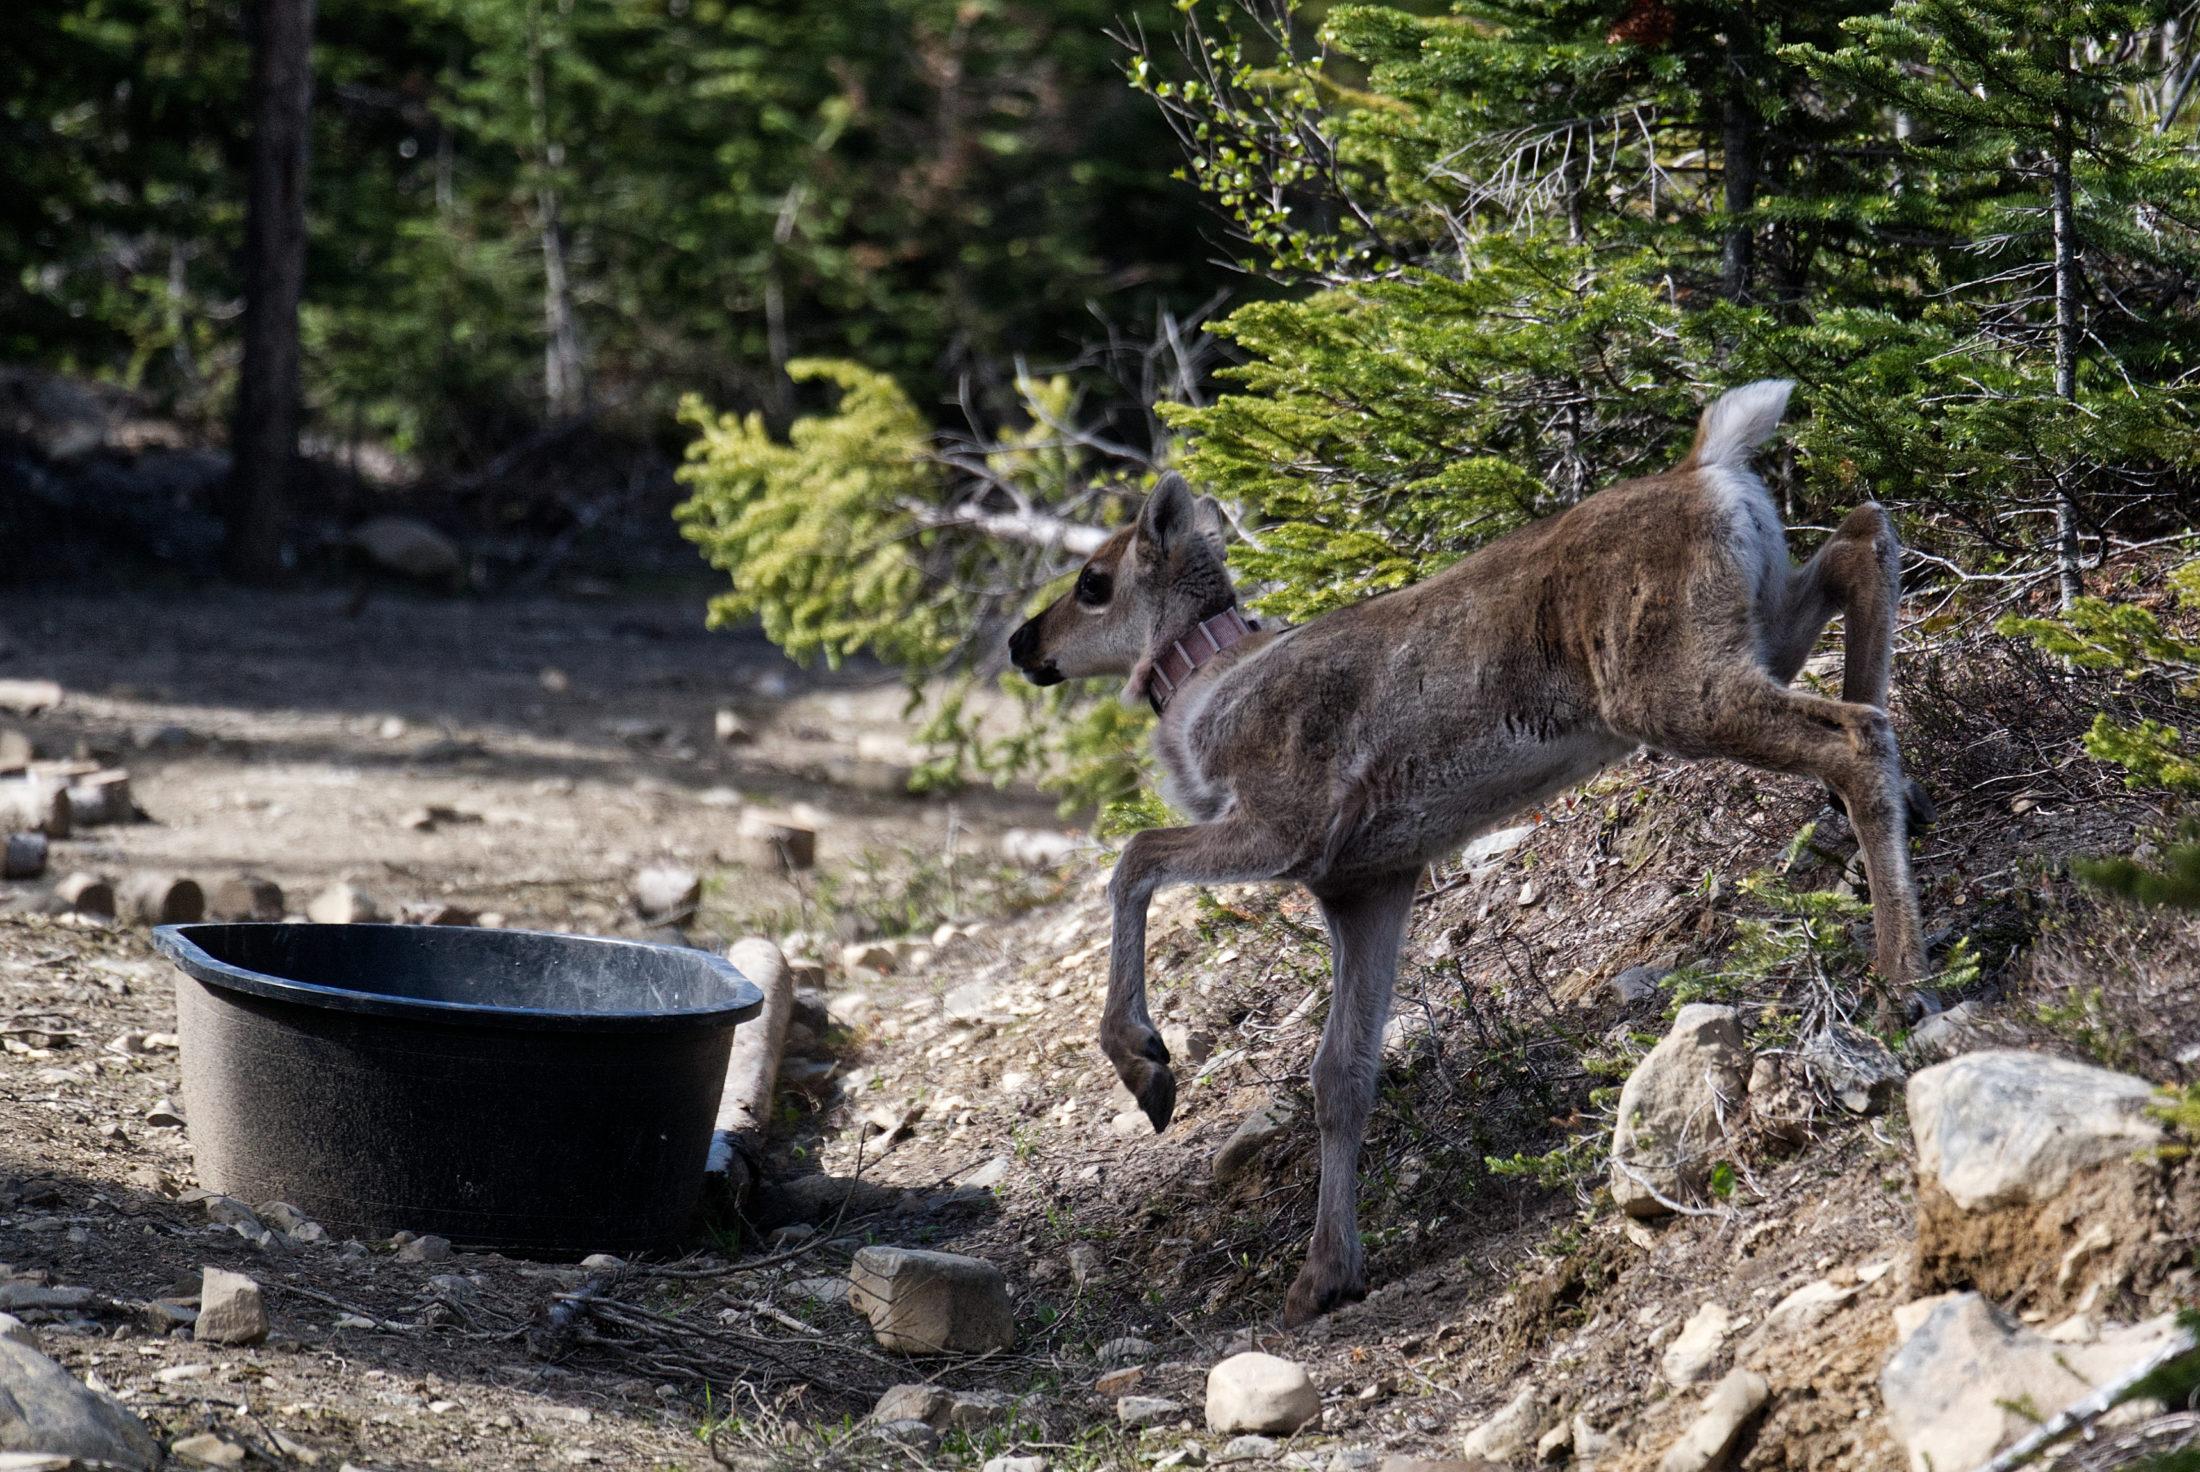 caribou calf Klinse-za pen food